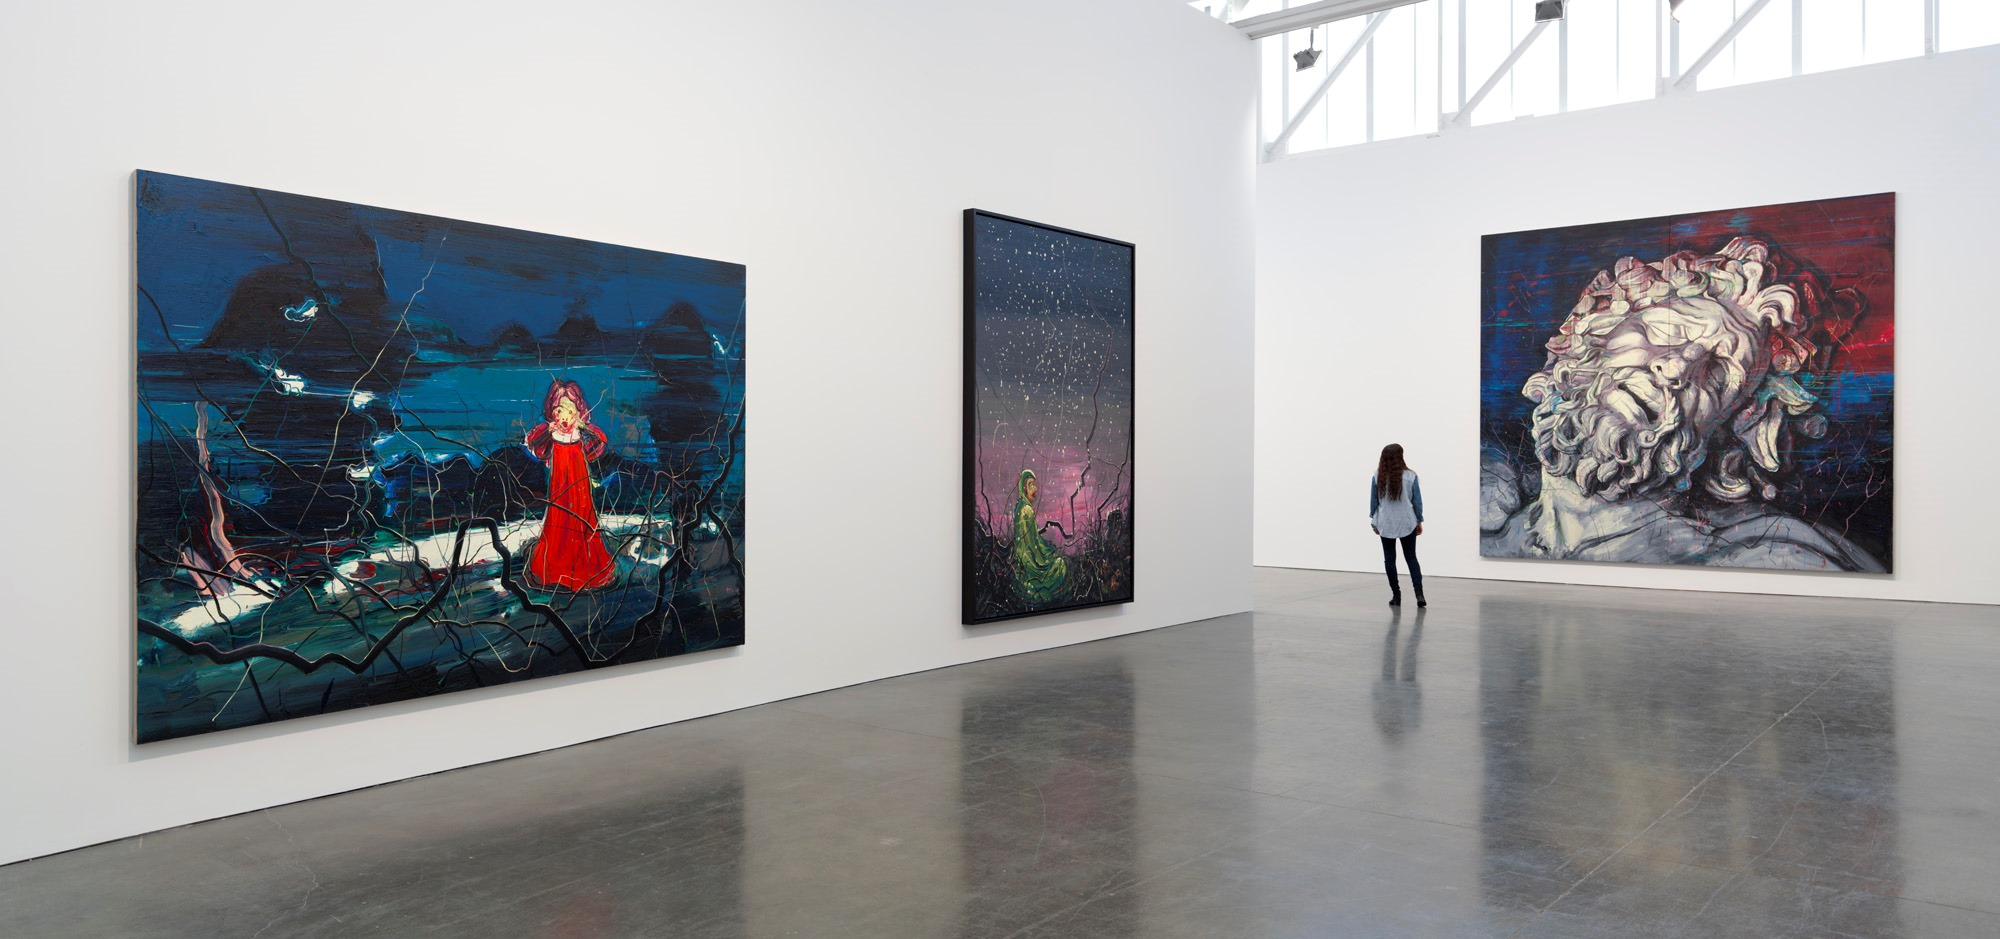 4_FANZH-2015-555-Paintings-Drawings-2-Sculptures-Install-71.jpg